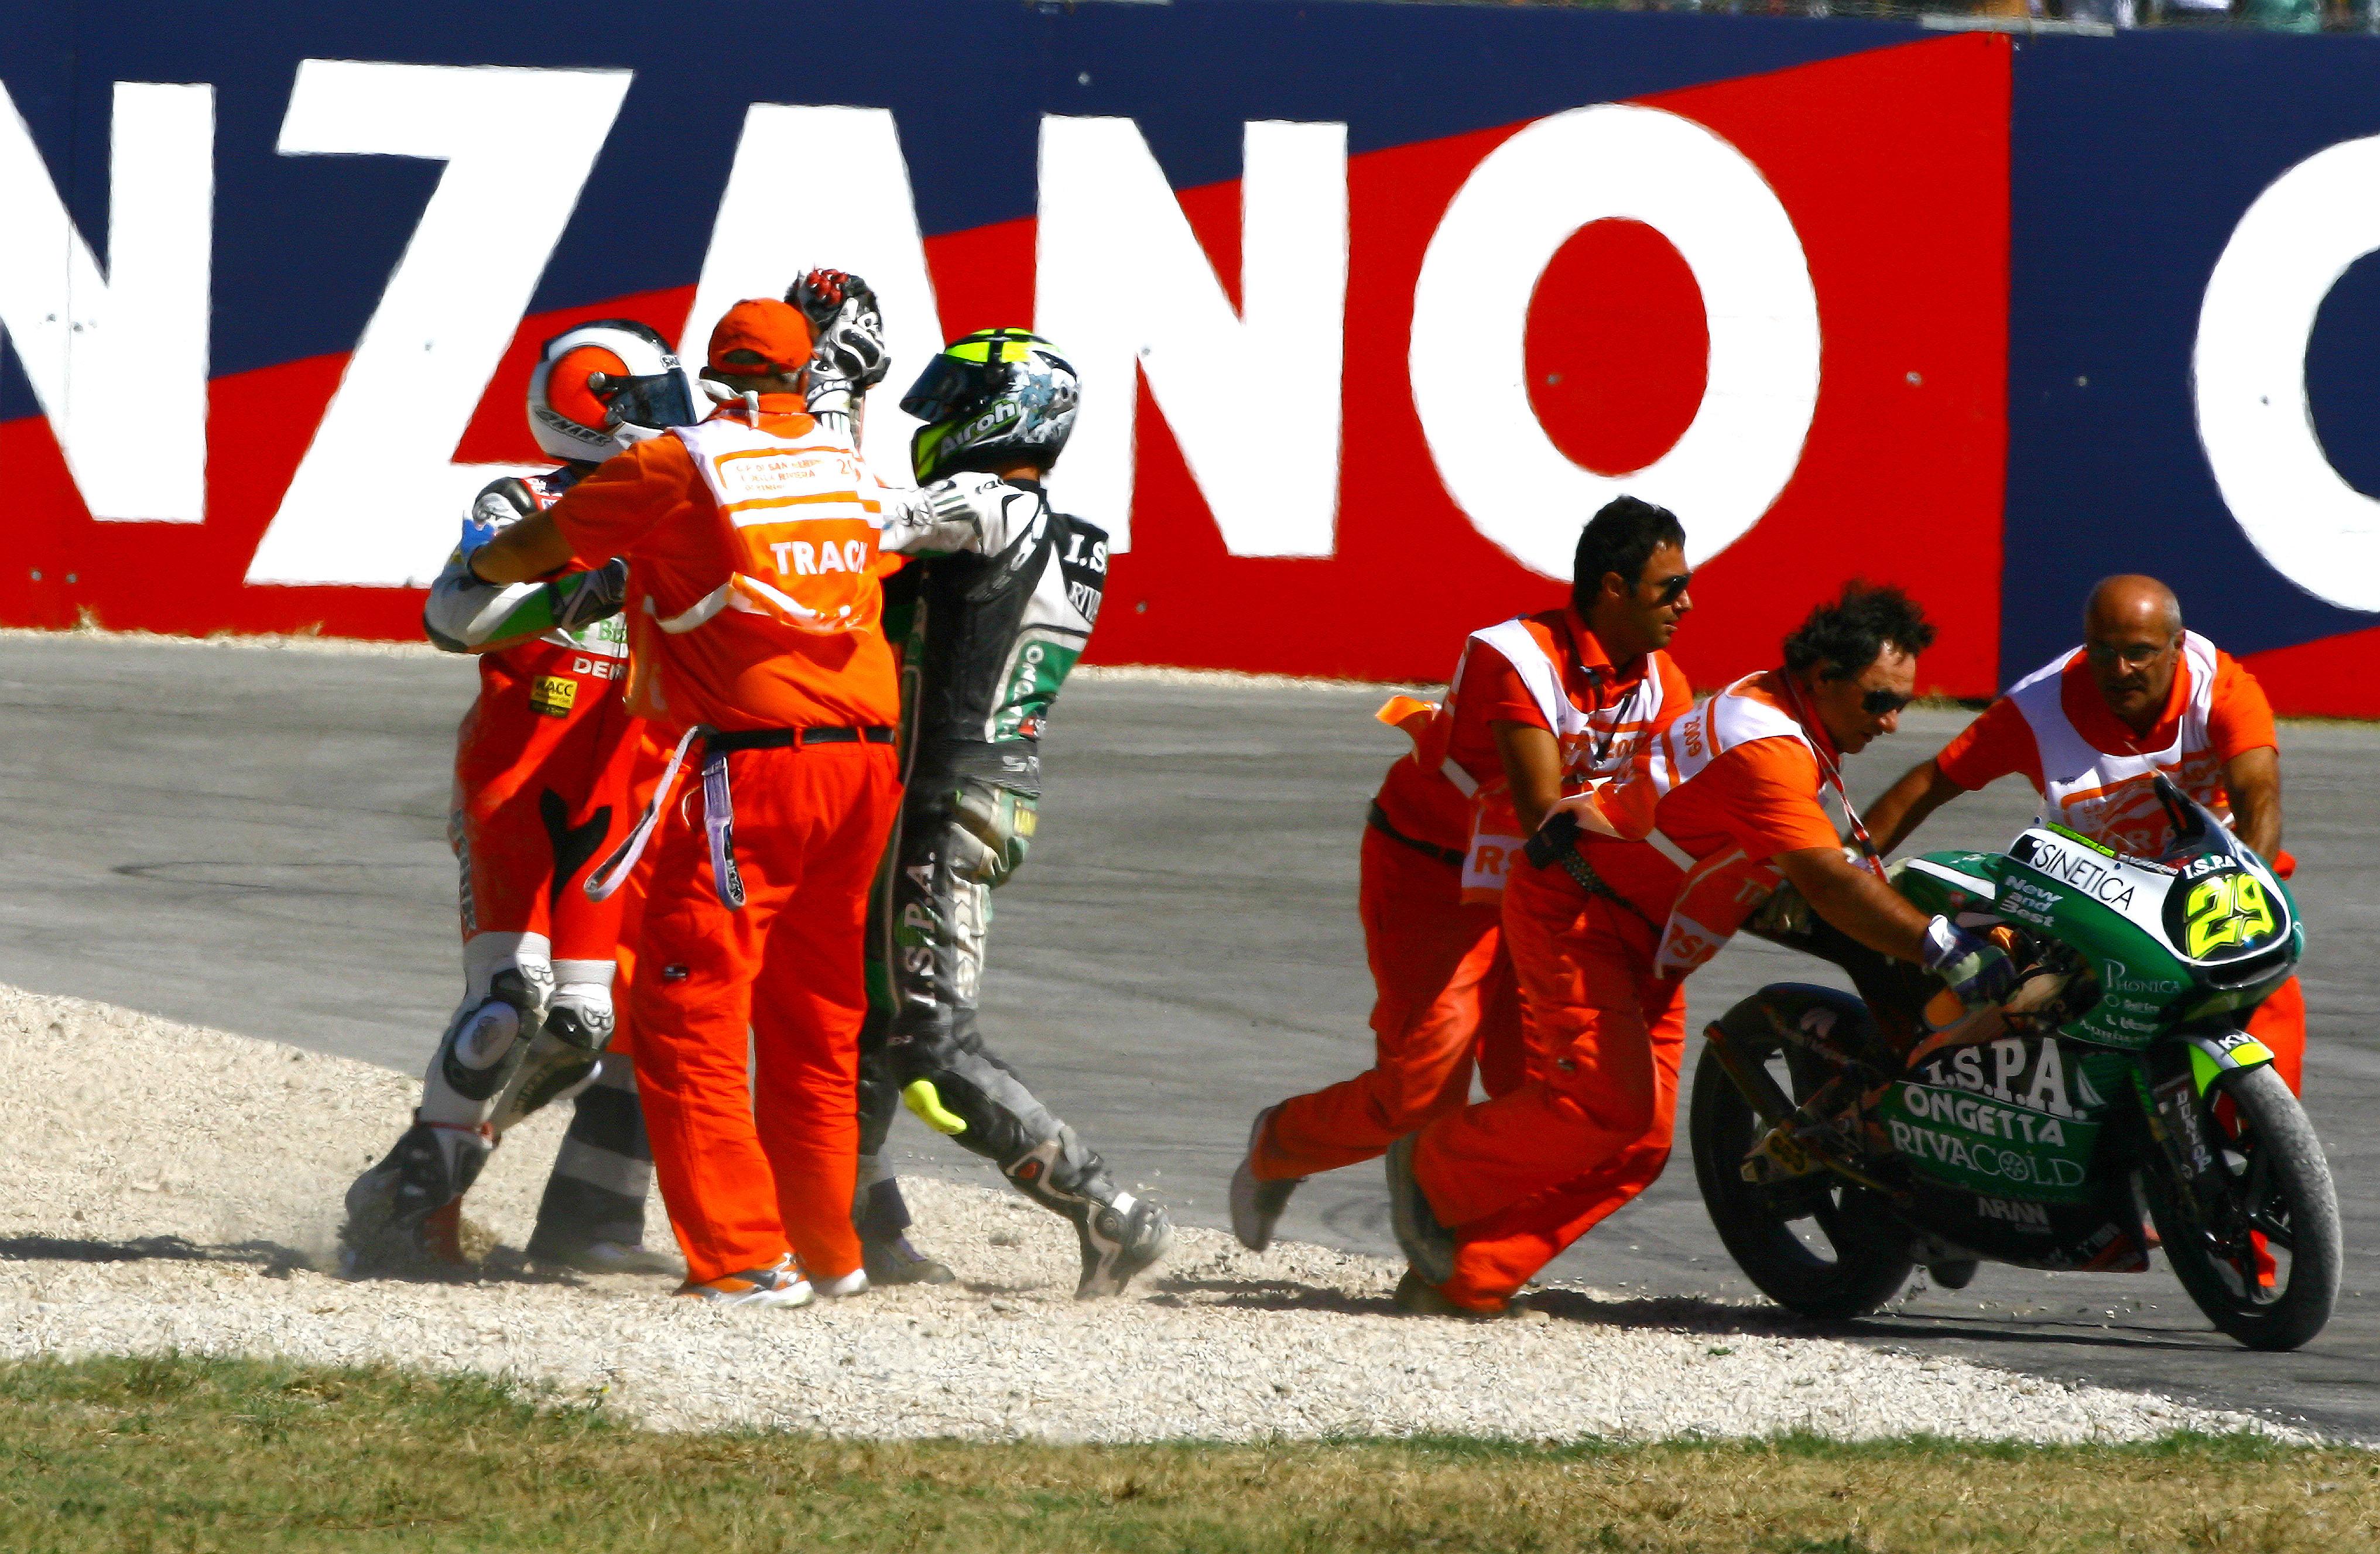 Andrea Iannone Pol Espargaro crash Misano 125cc 2009